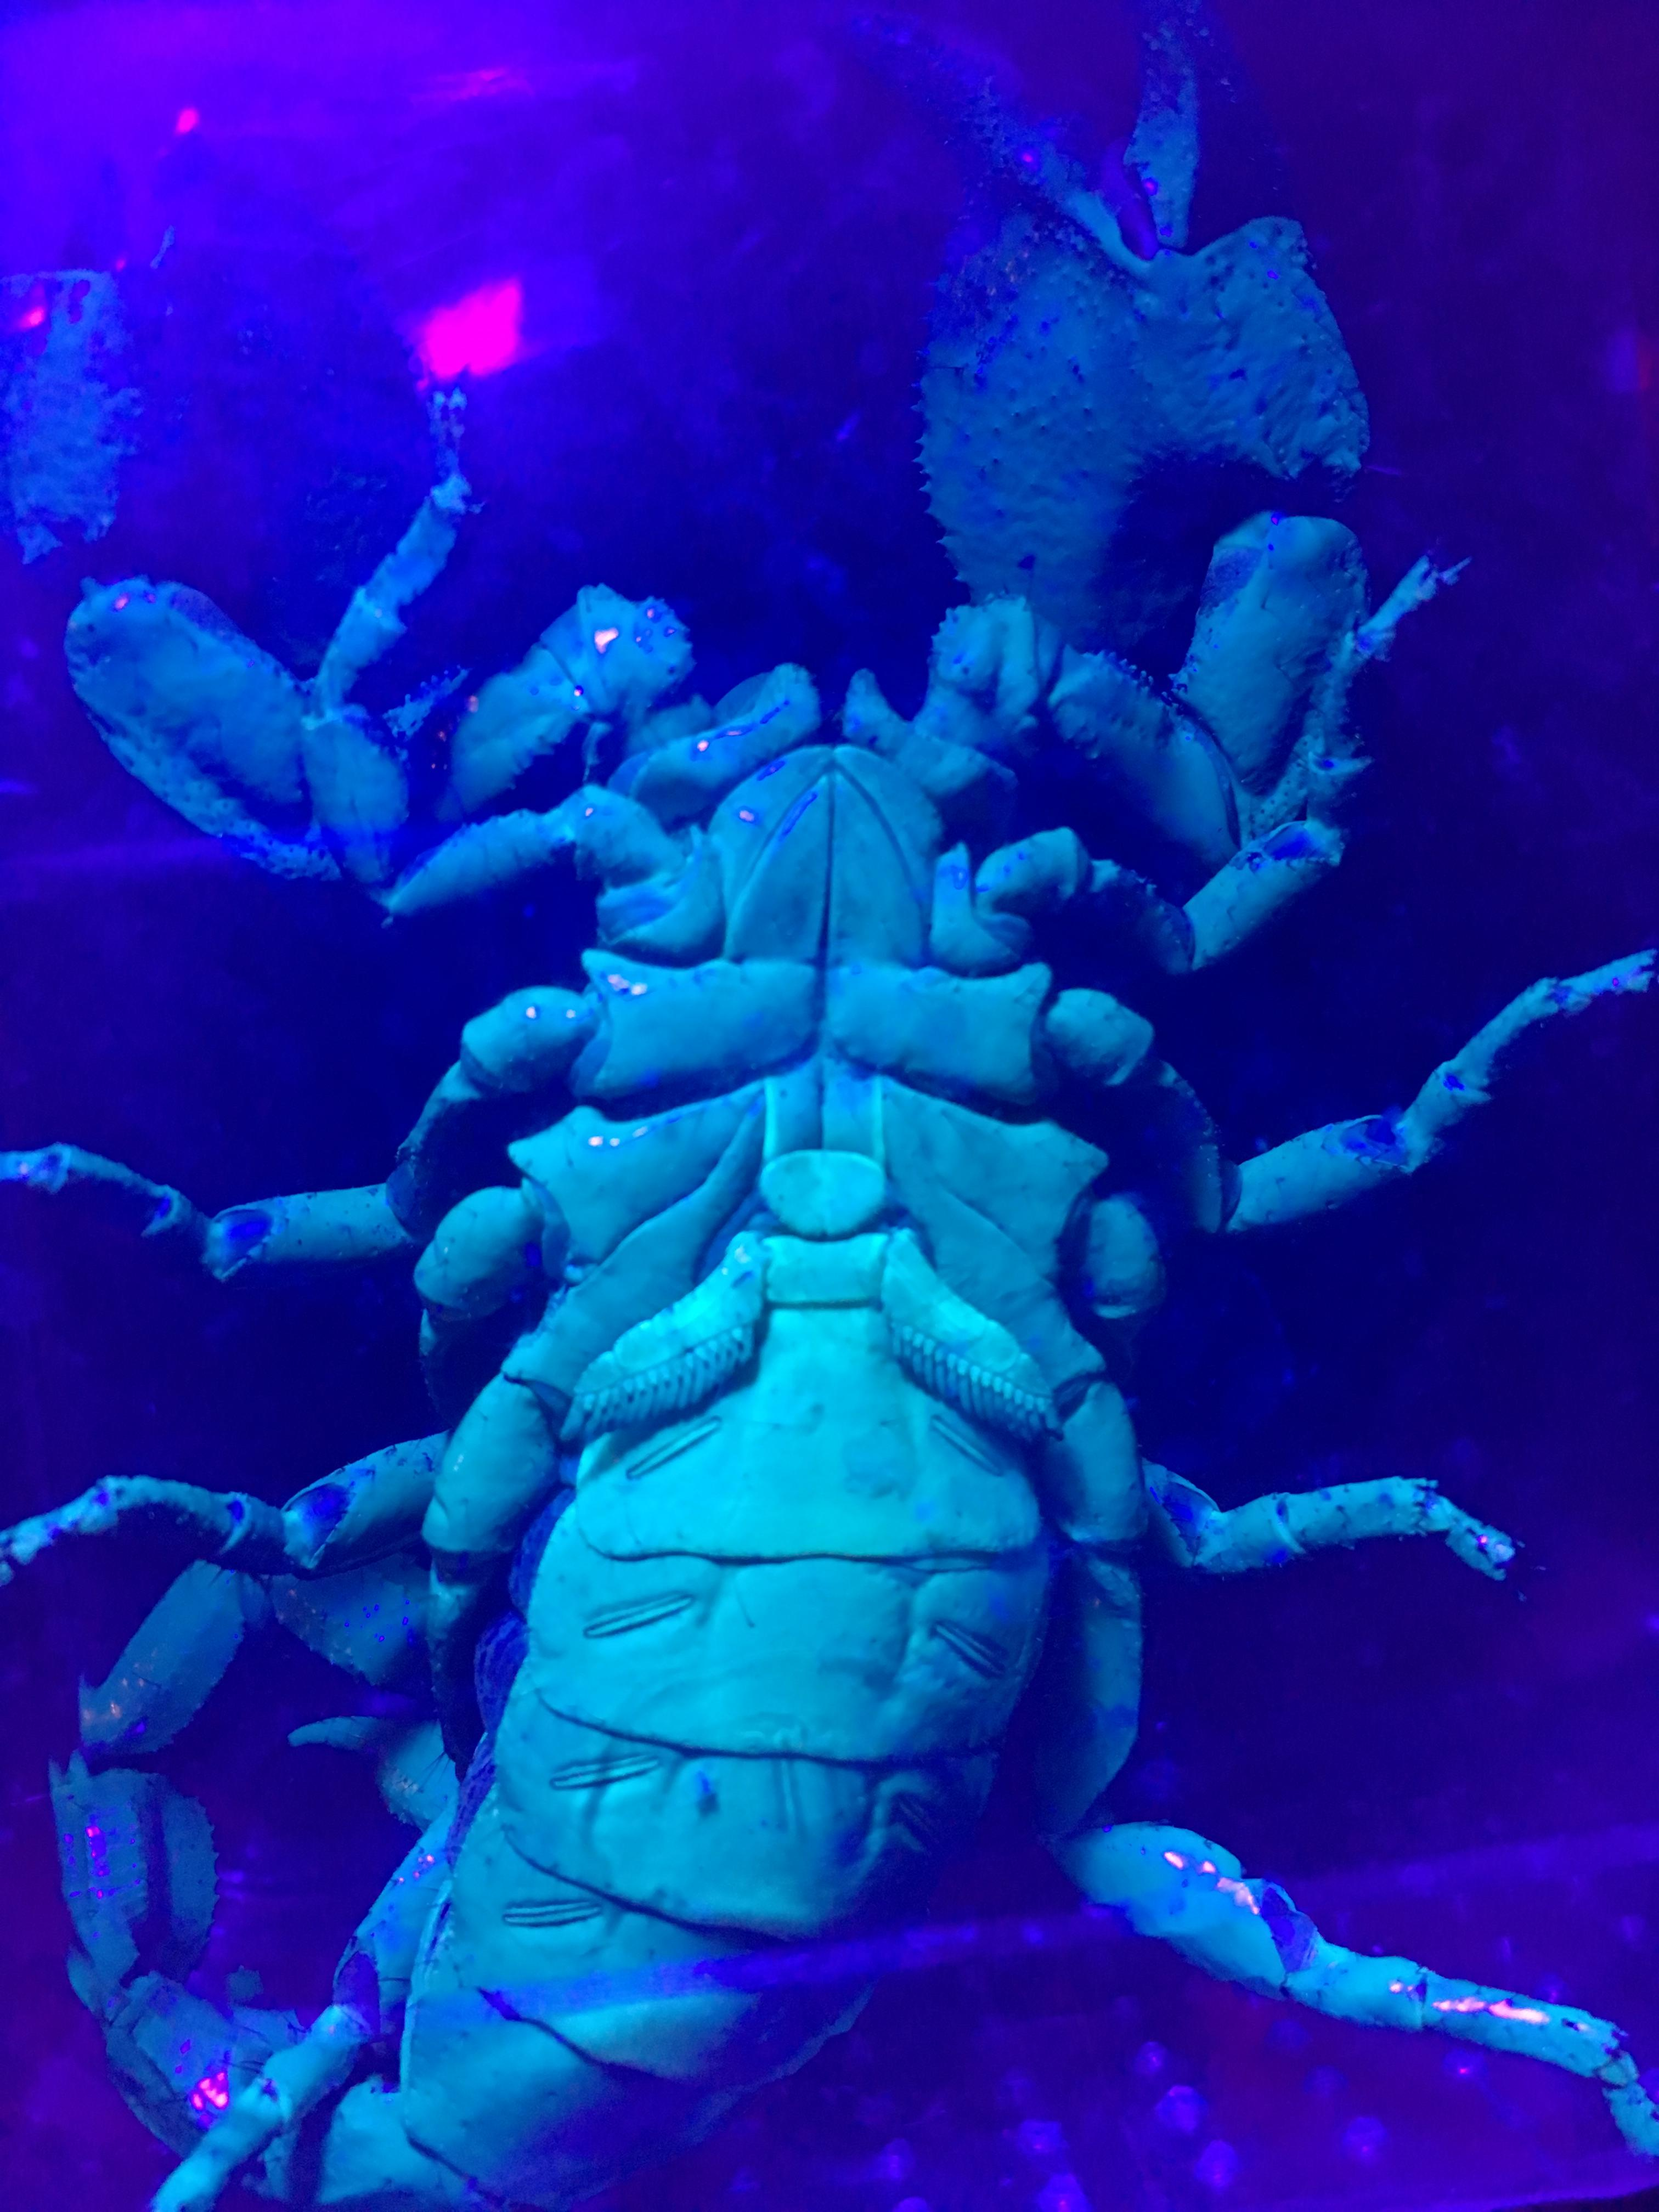 Help  sexing a emperor scorpion (pandinus imperator)-cd6f22e3-2b23-4eb3-90ff-07f0baadbfc2_1556653396860.jpeg